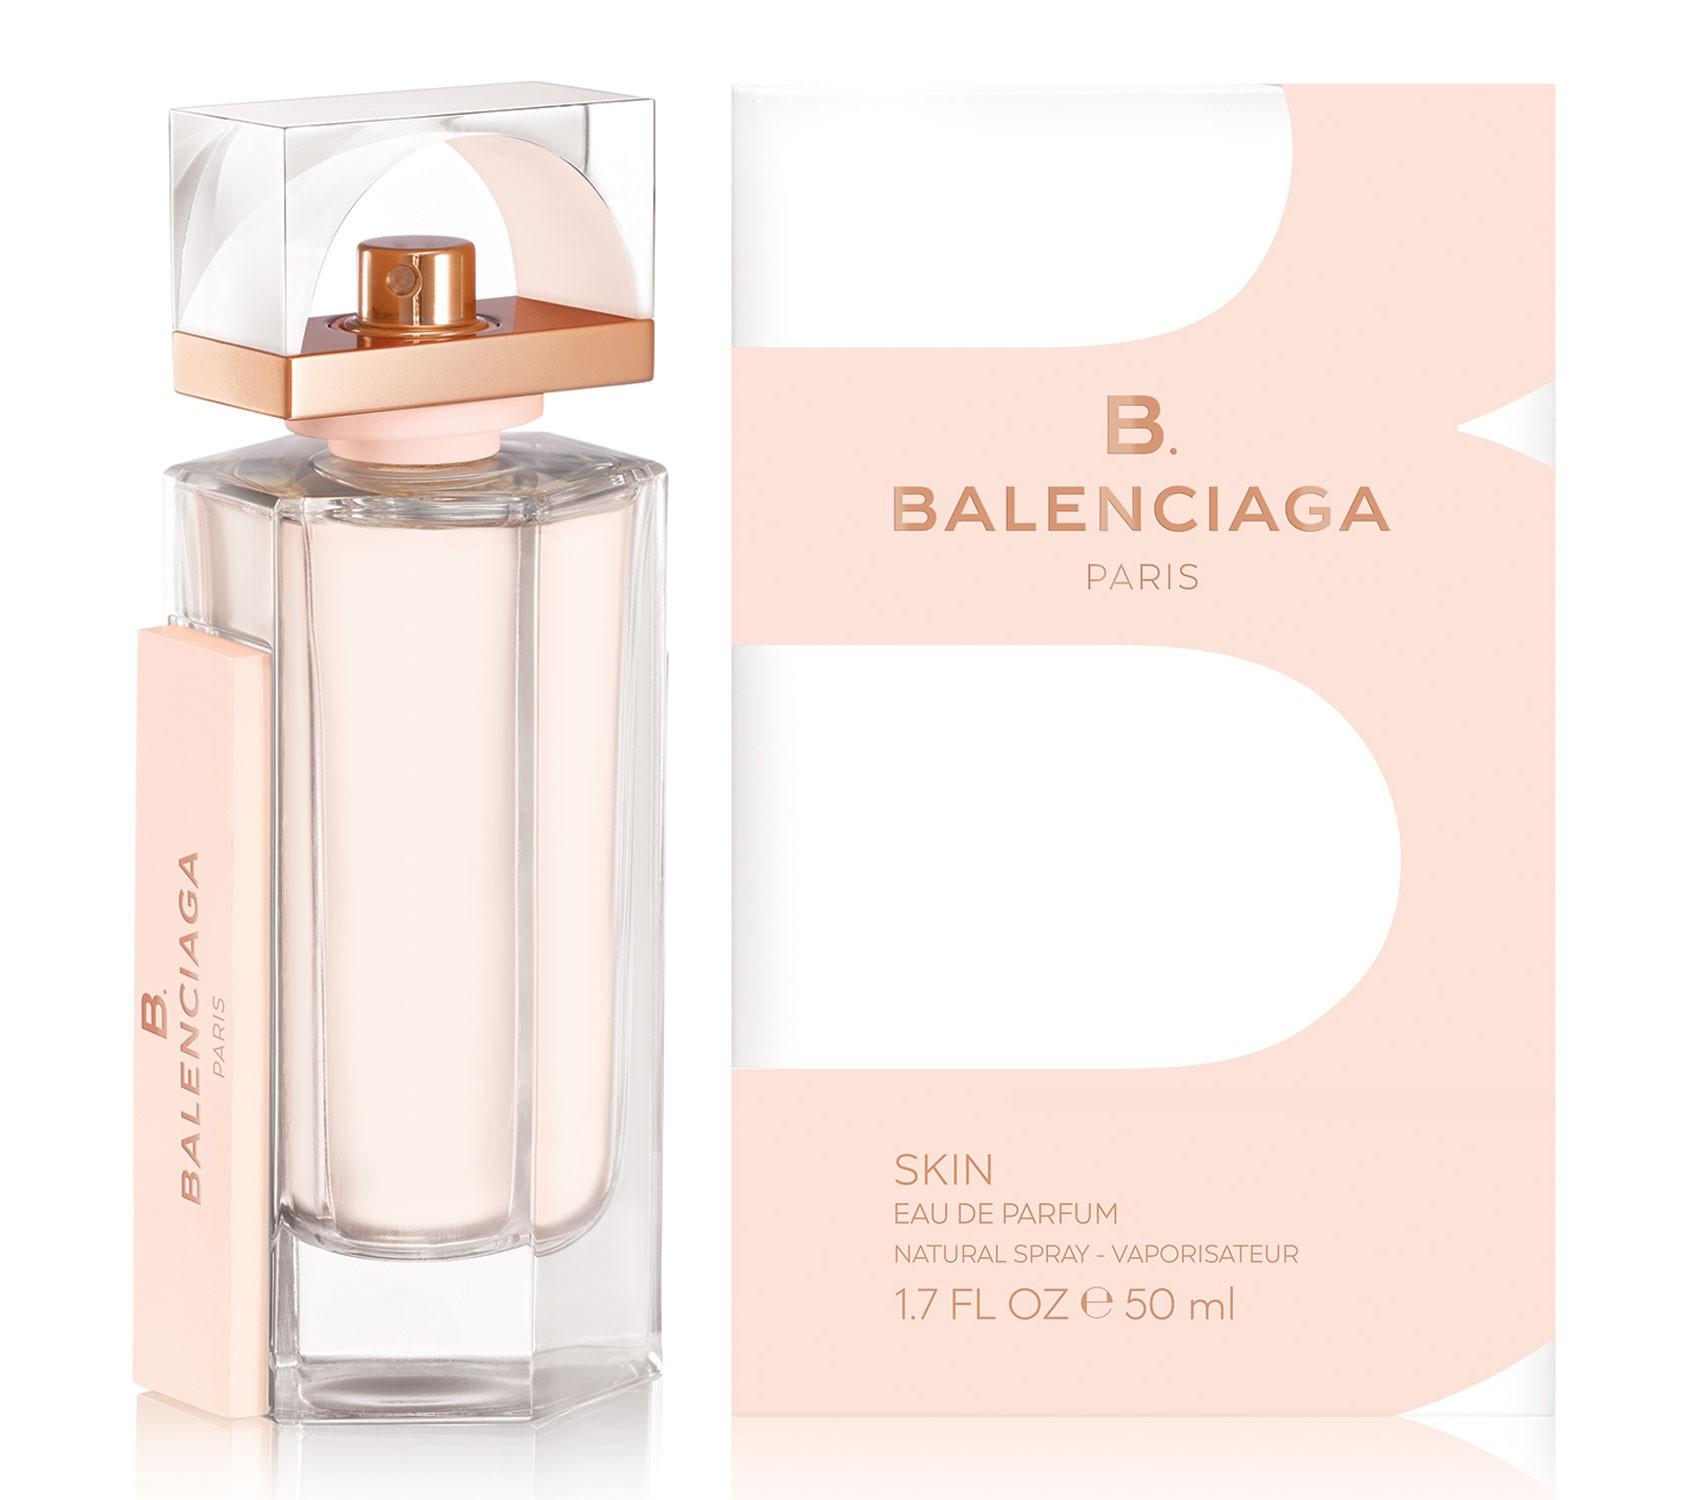 B Balenciaga Skin аромат для женщин